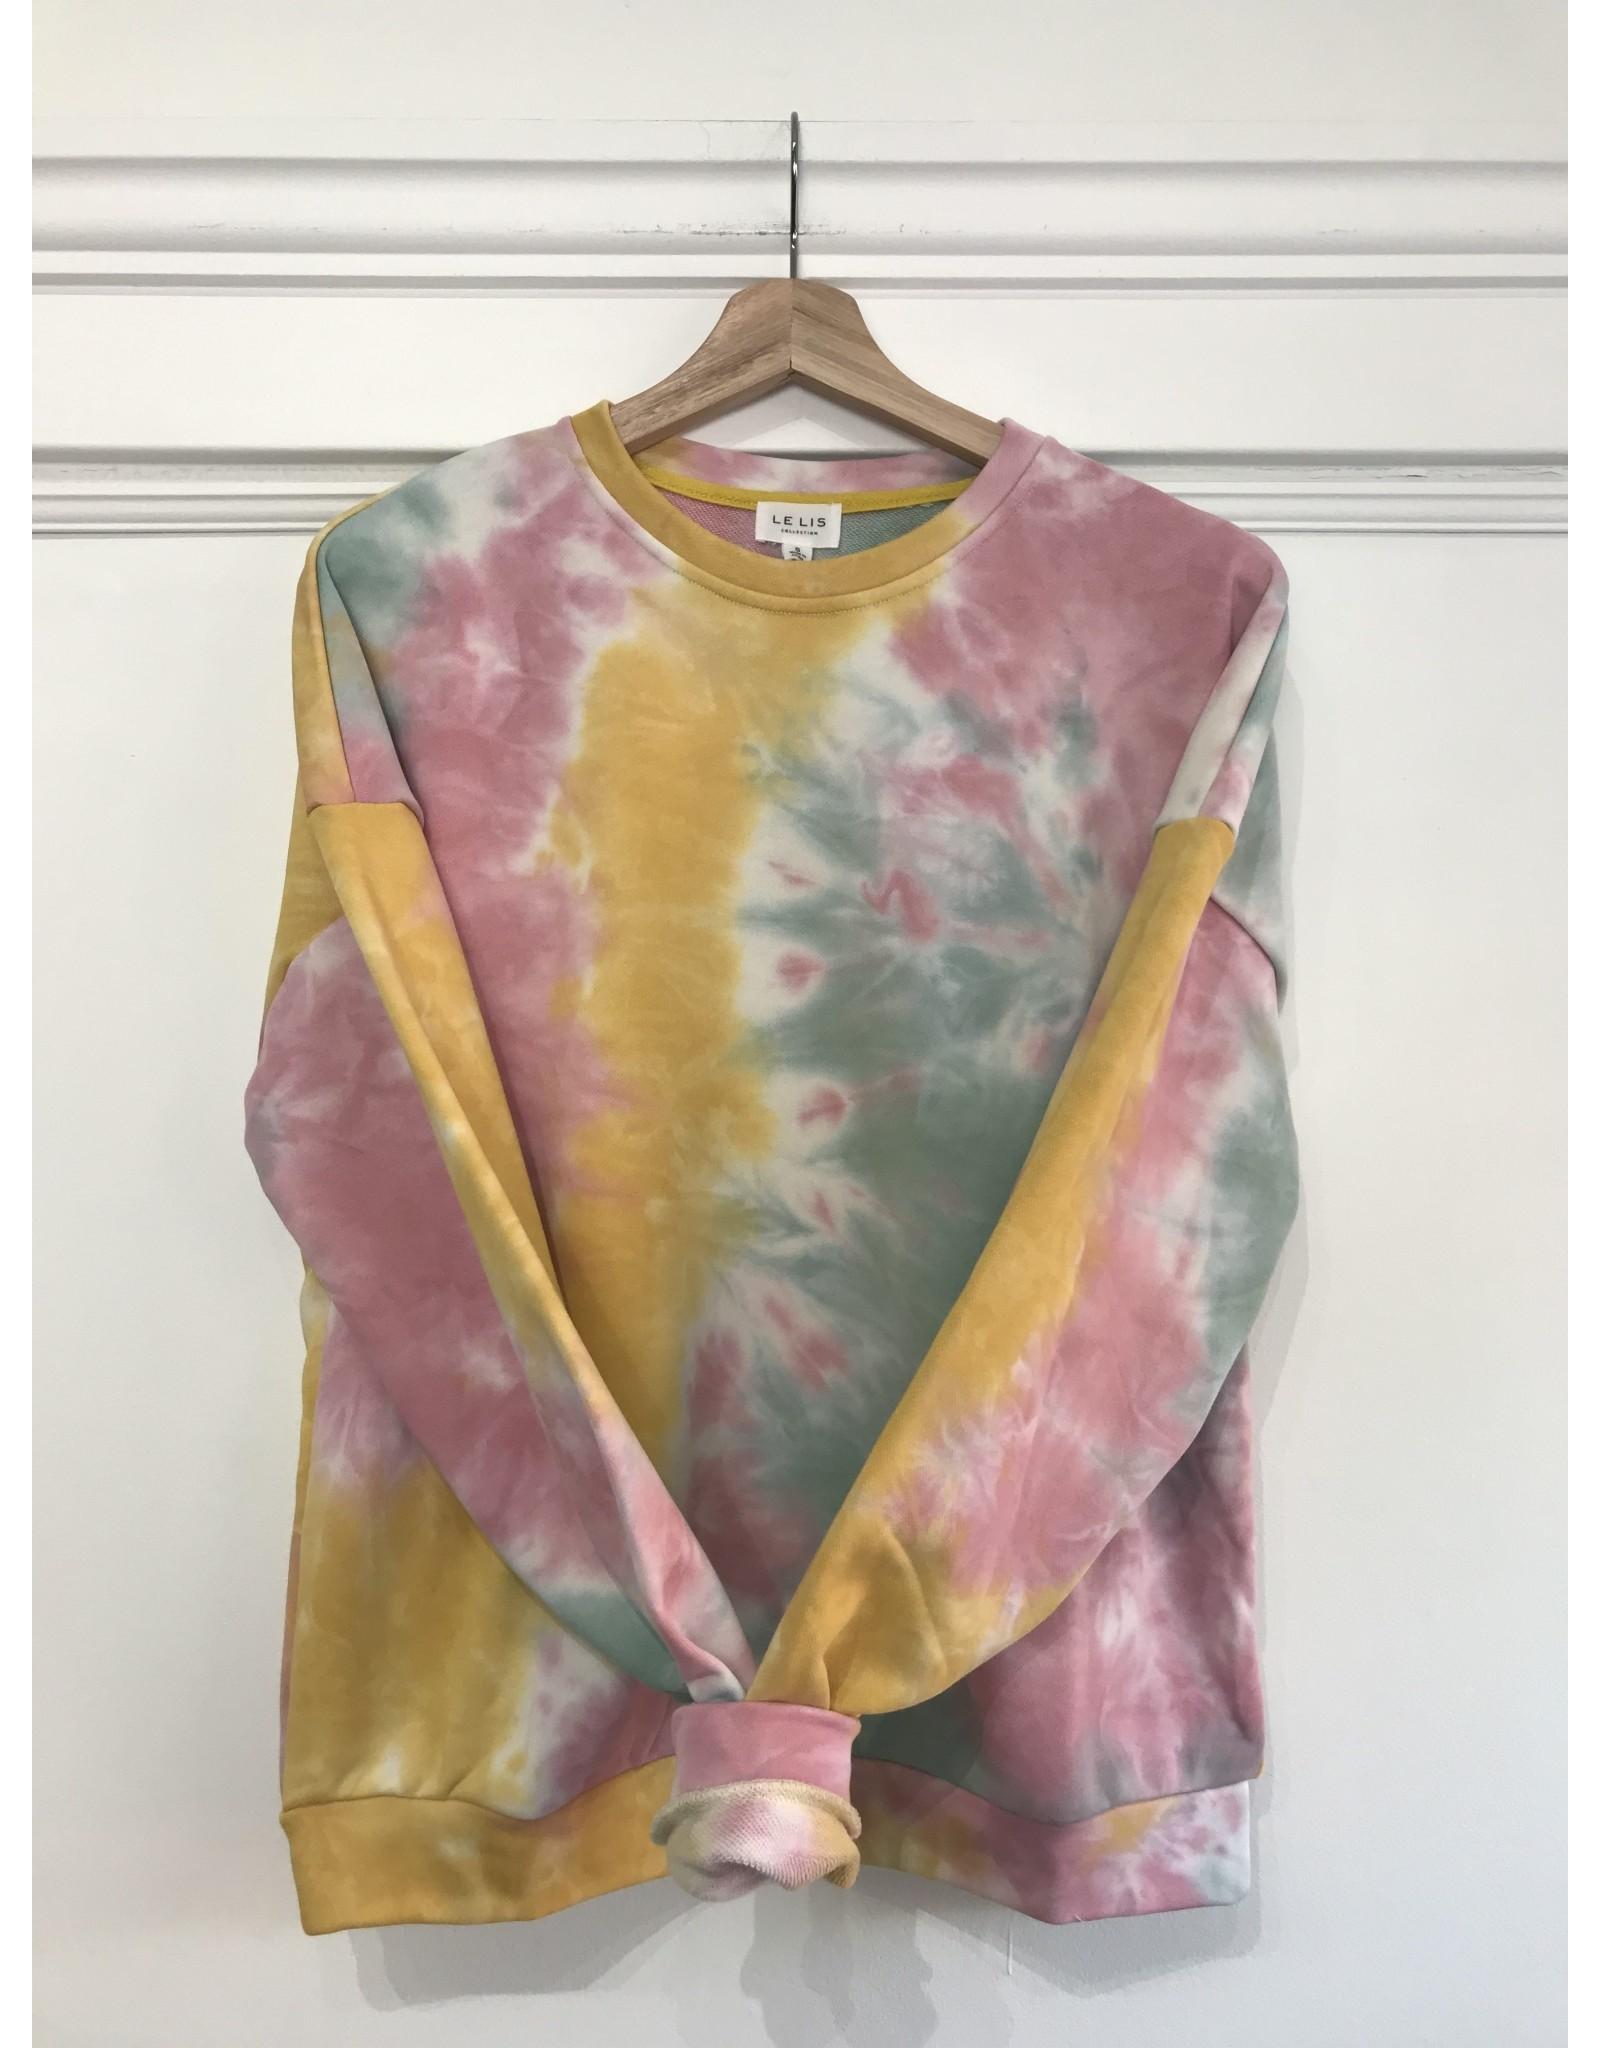 Corinne - Tie dye sweatshirt